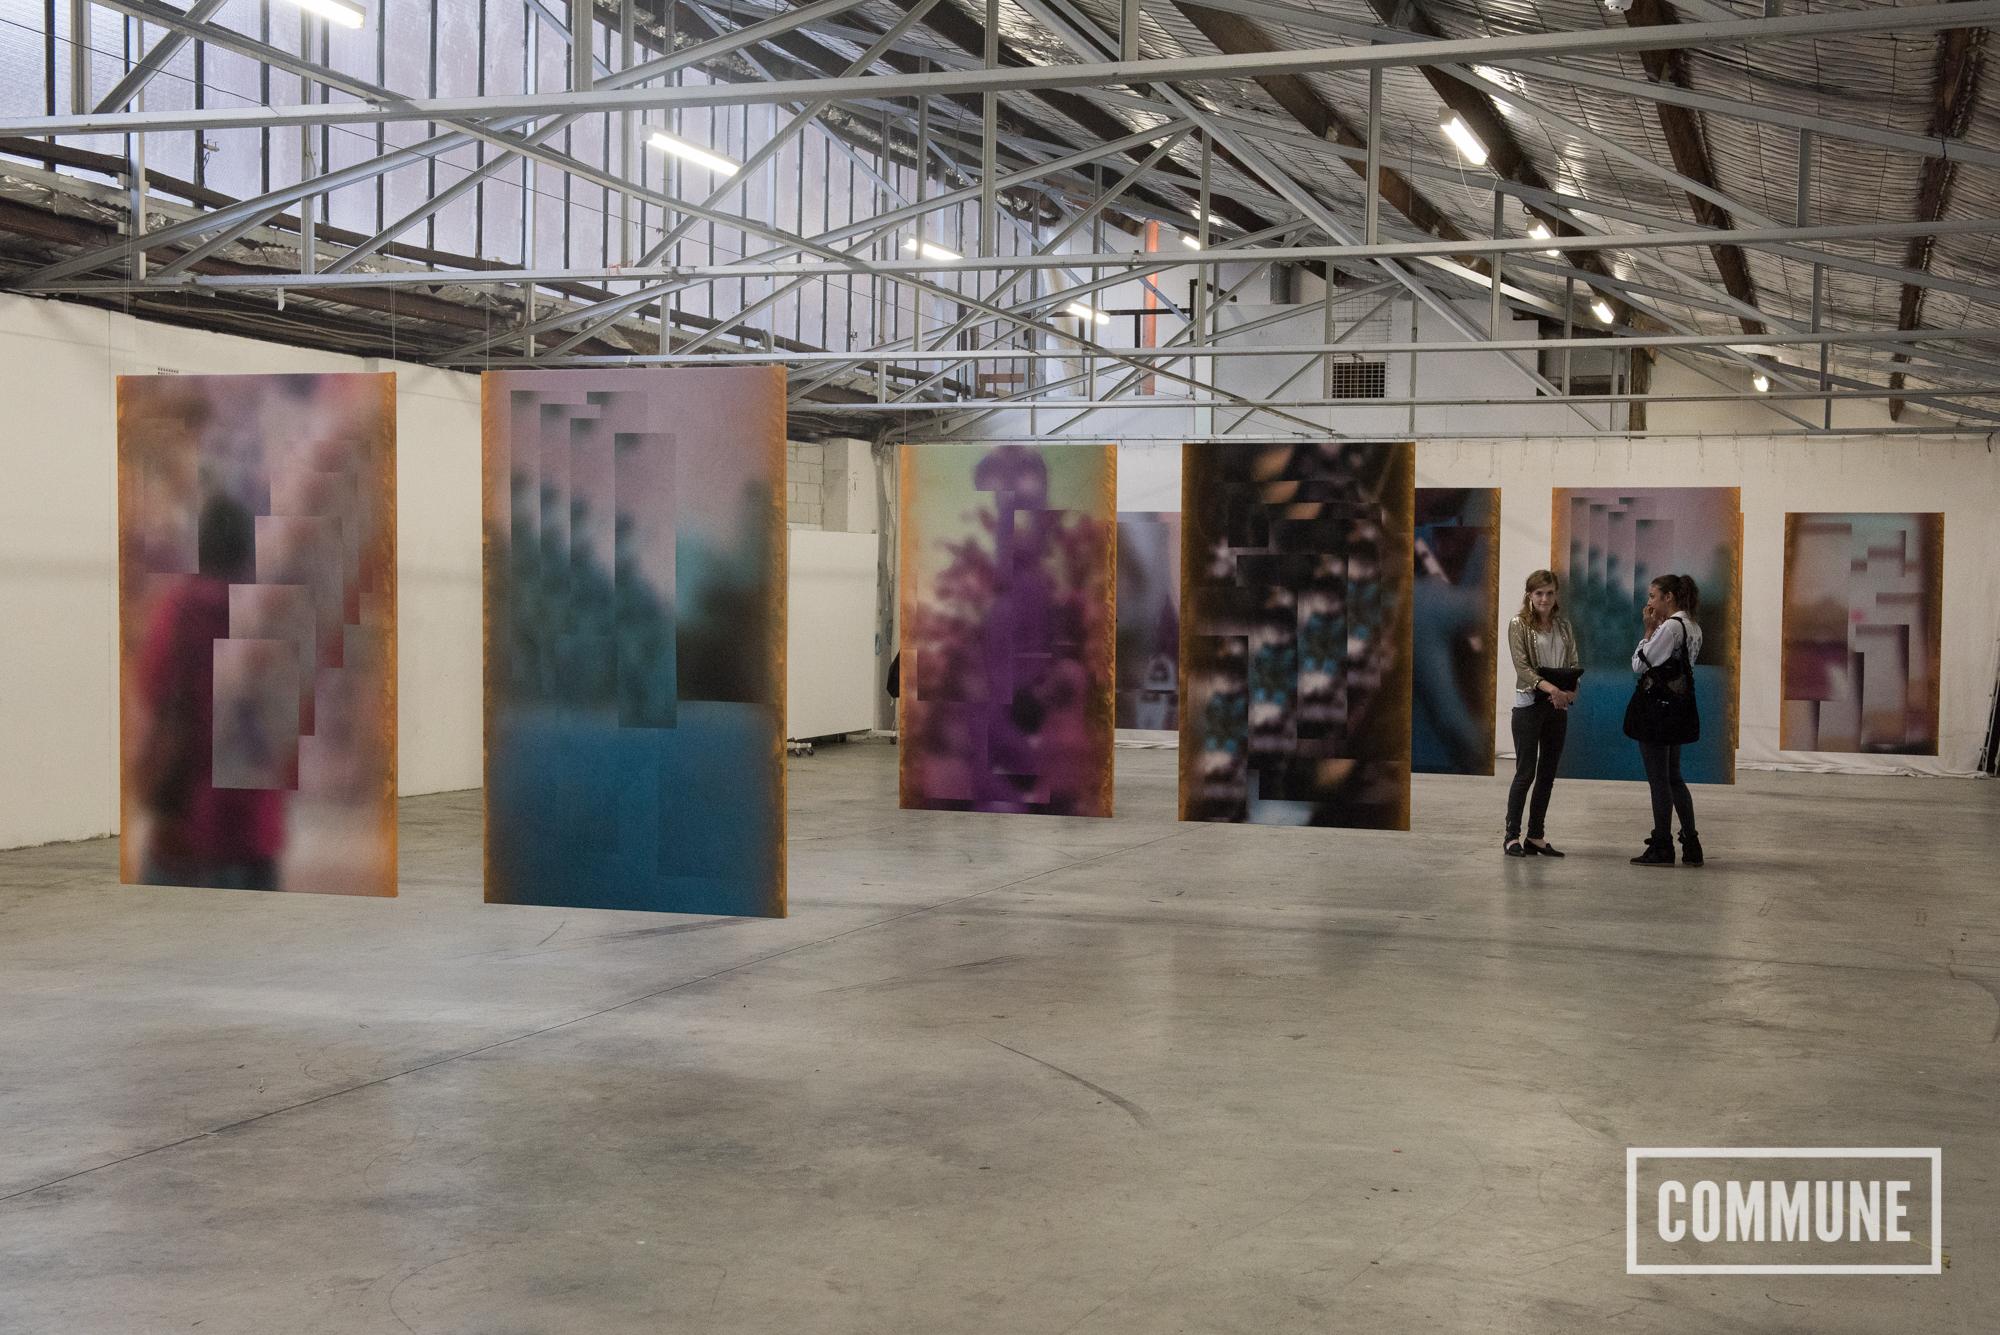 COMMUNE_Ry_David_Bradley_Exhibition-0445.jpg